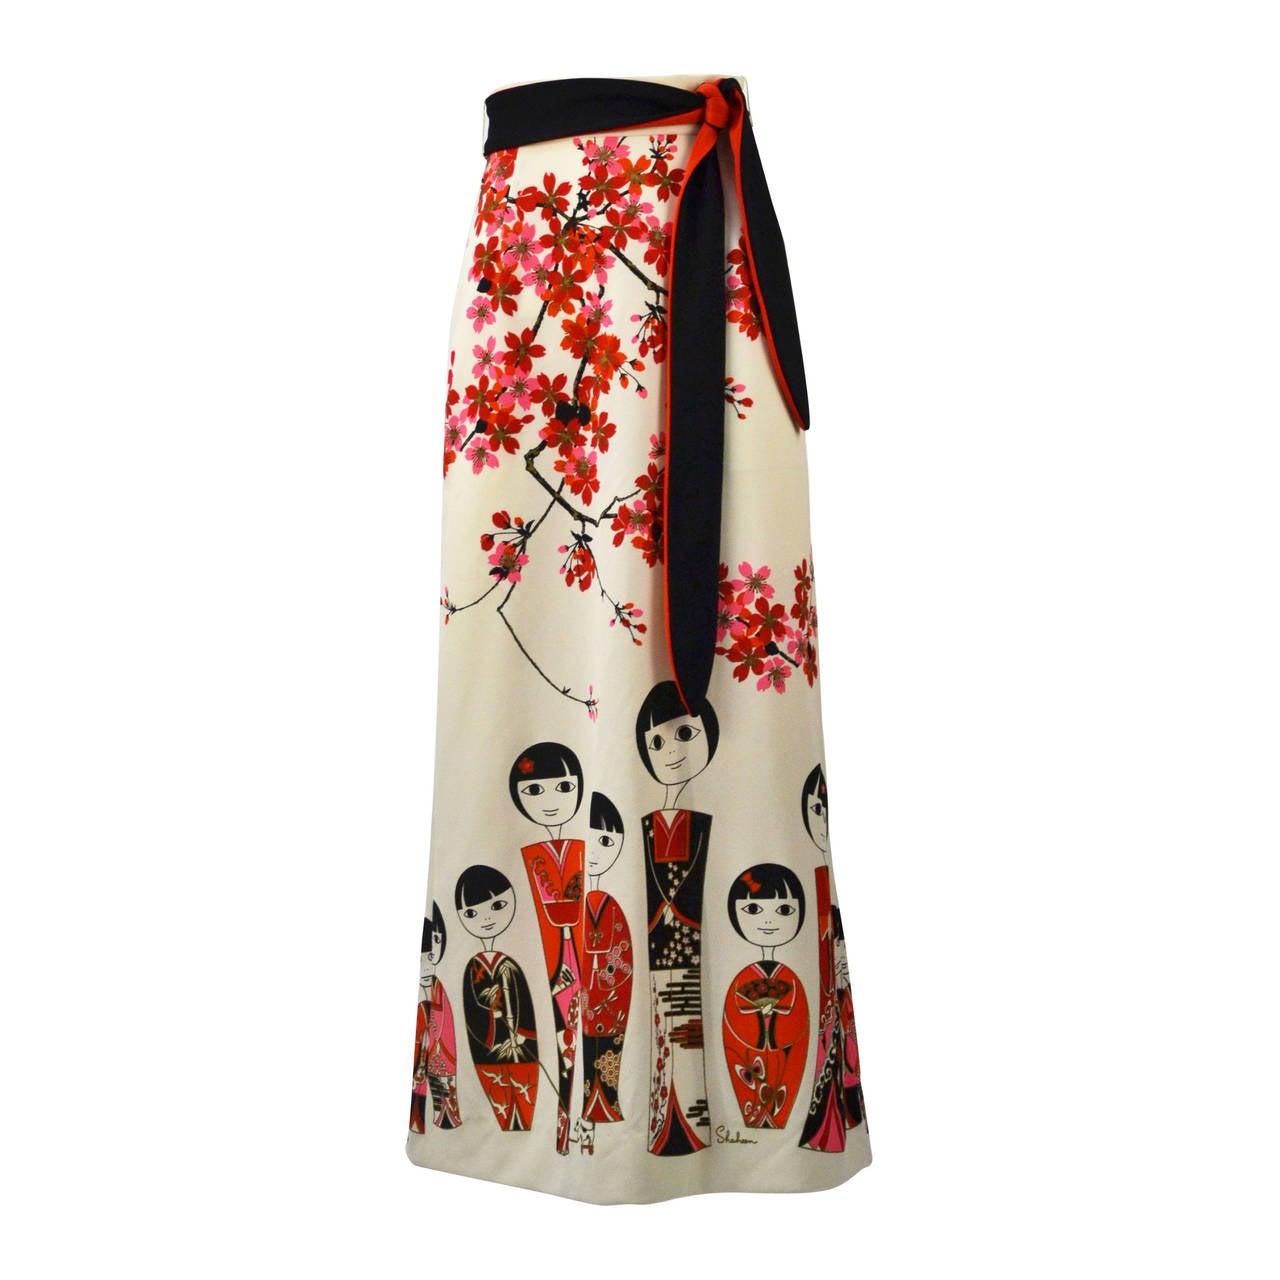 1960s Shaheen Kokeshi Doll Border Print Maxi Skirt with Obi Belt